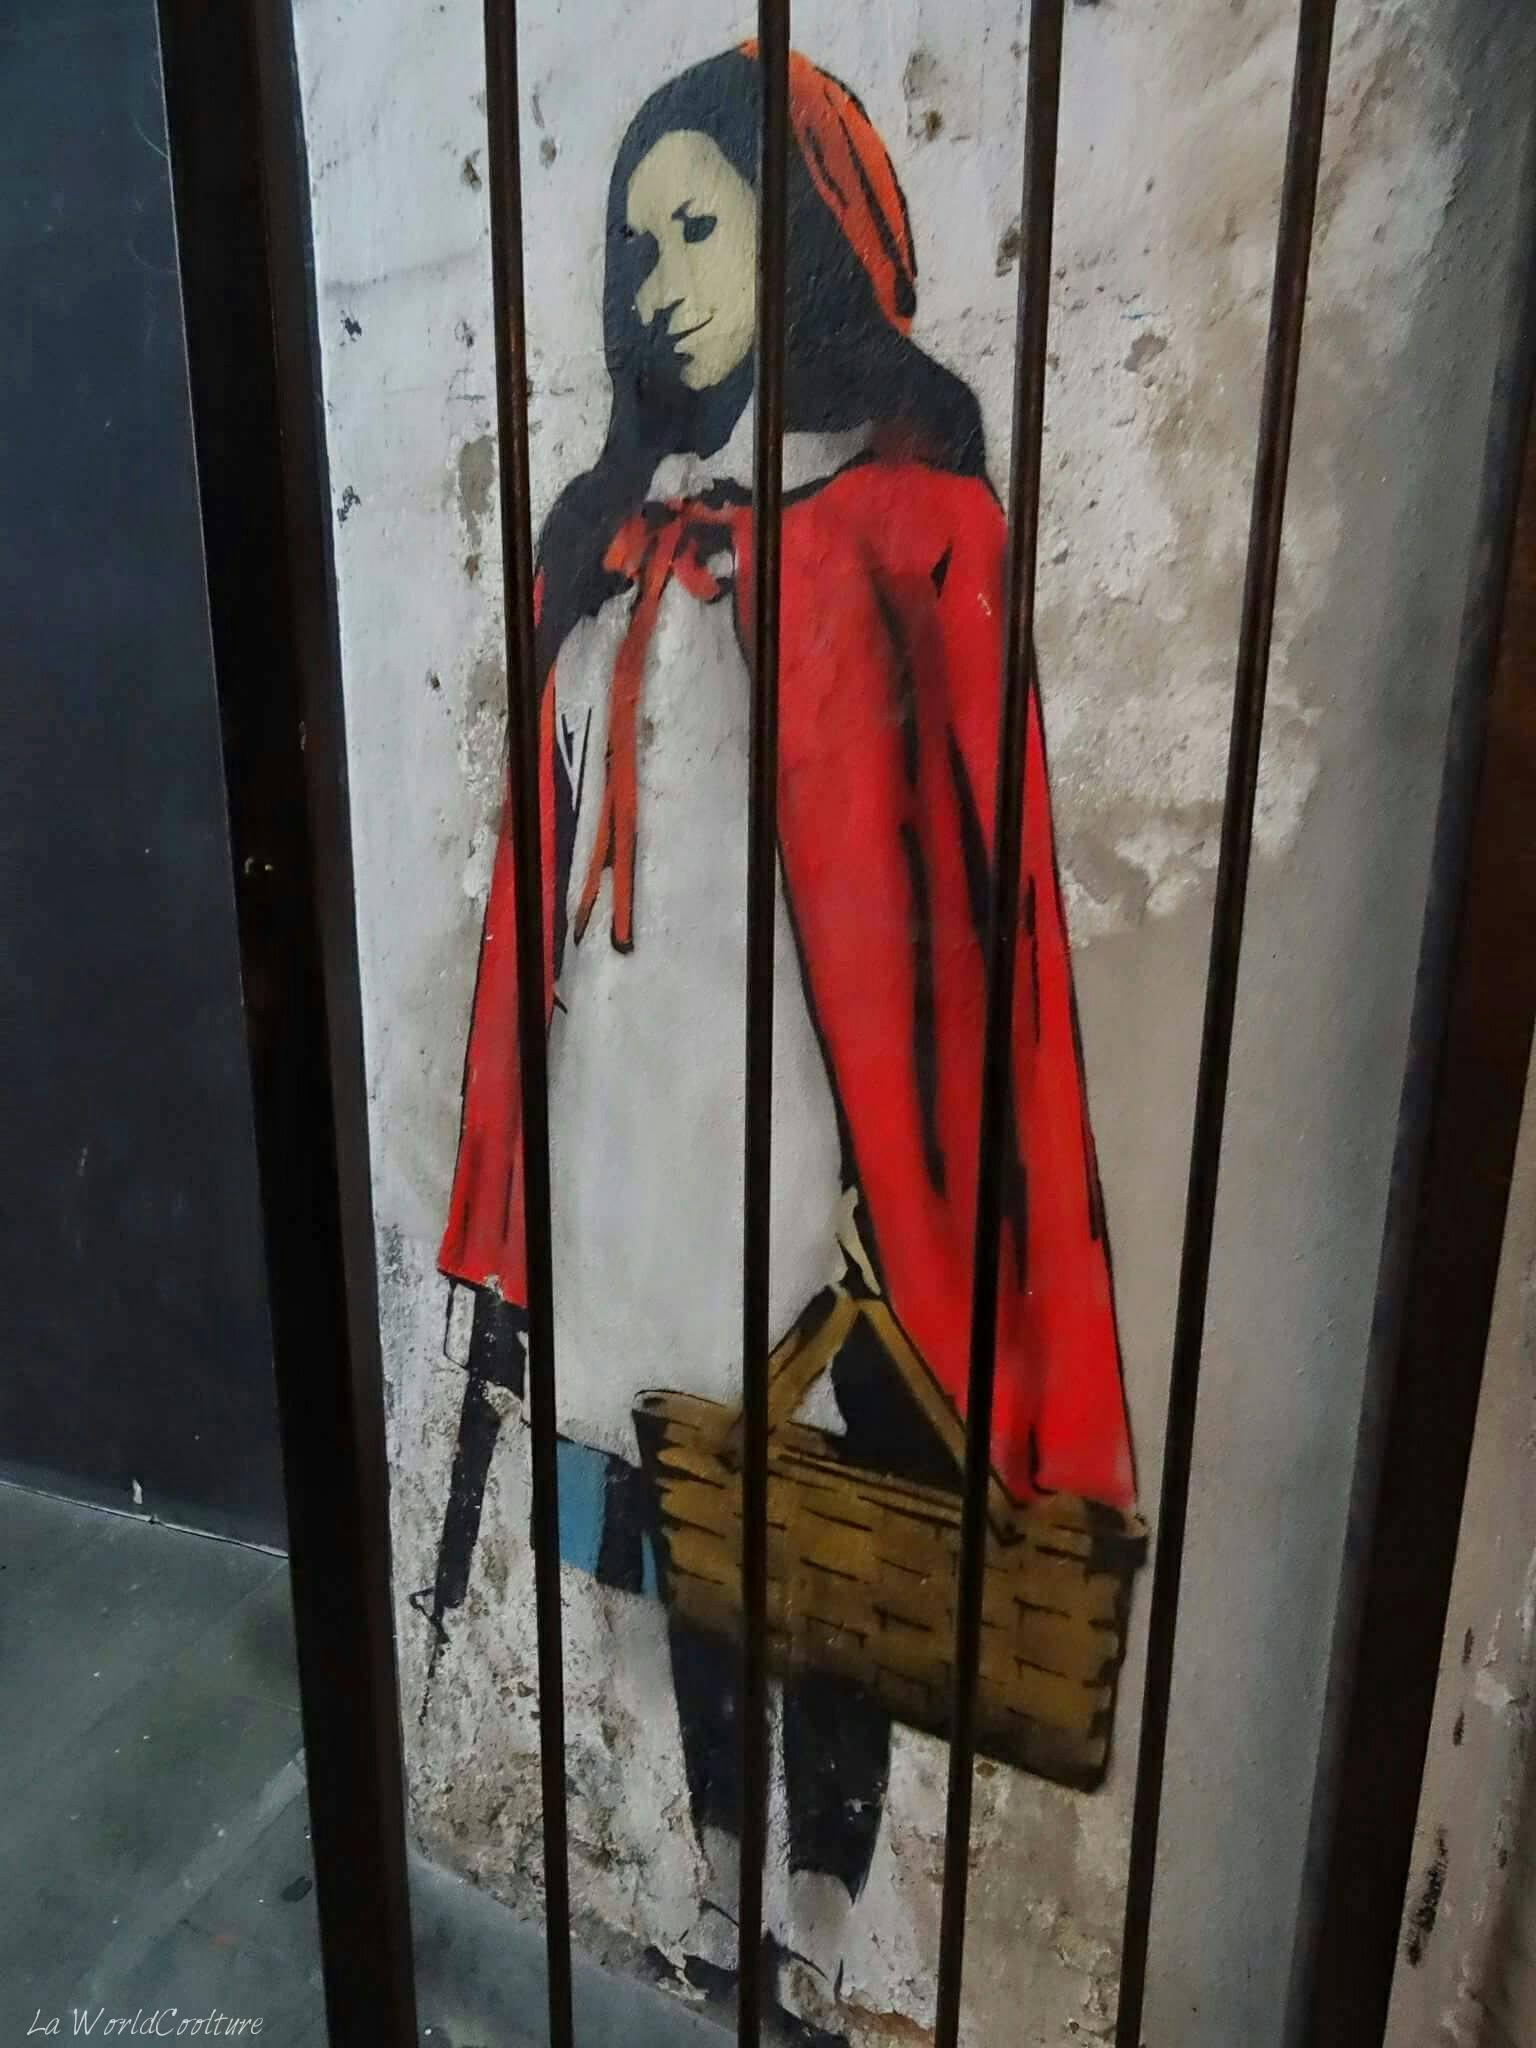 Street-art-Lx-Factory-Lisbonne